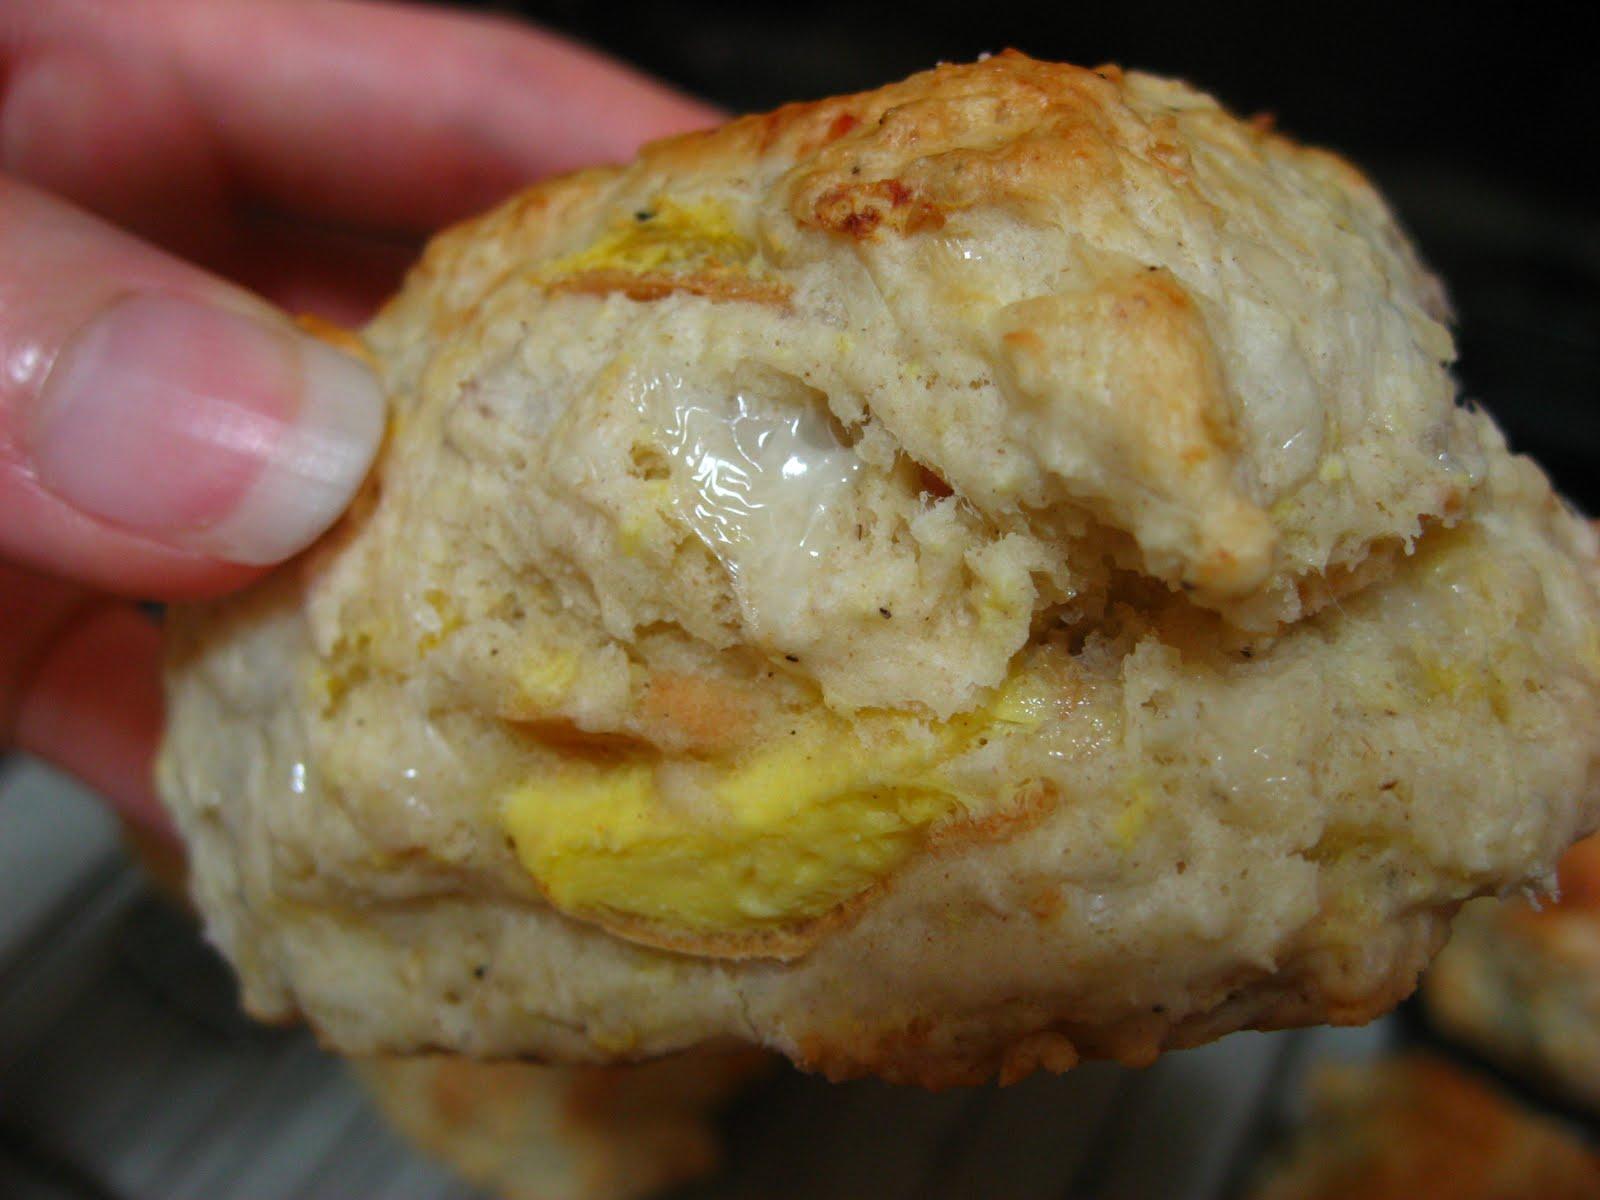 Slacker: Bacon, Egg, and Cheese Scones